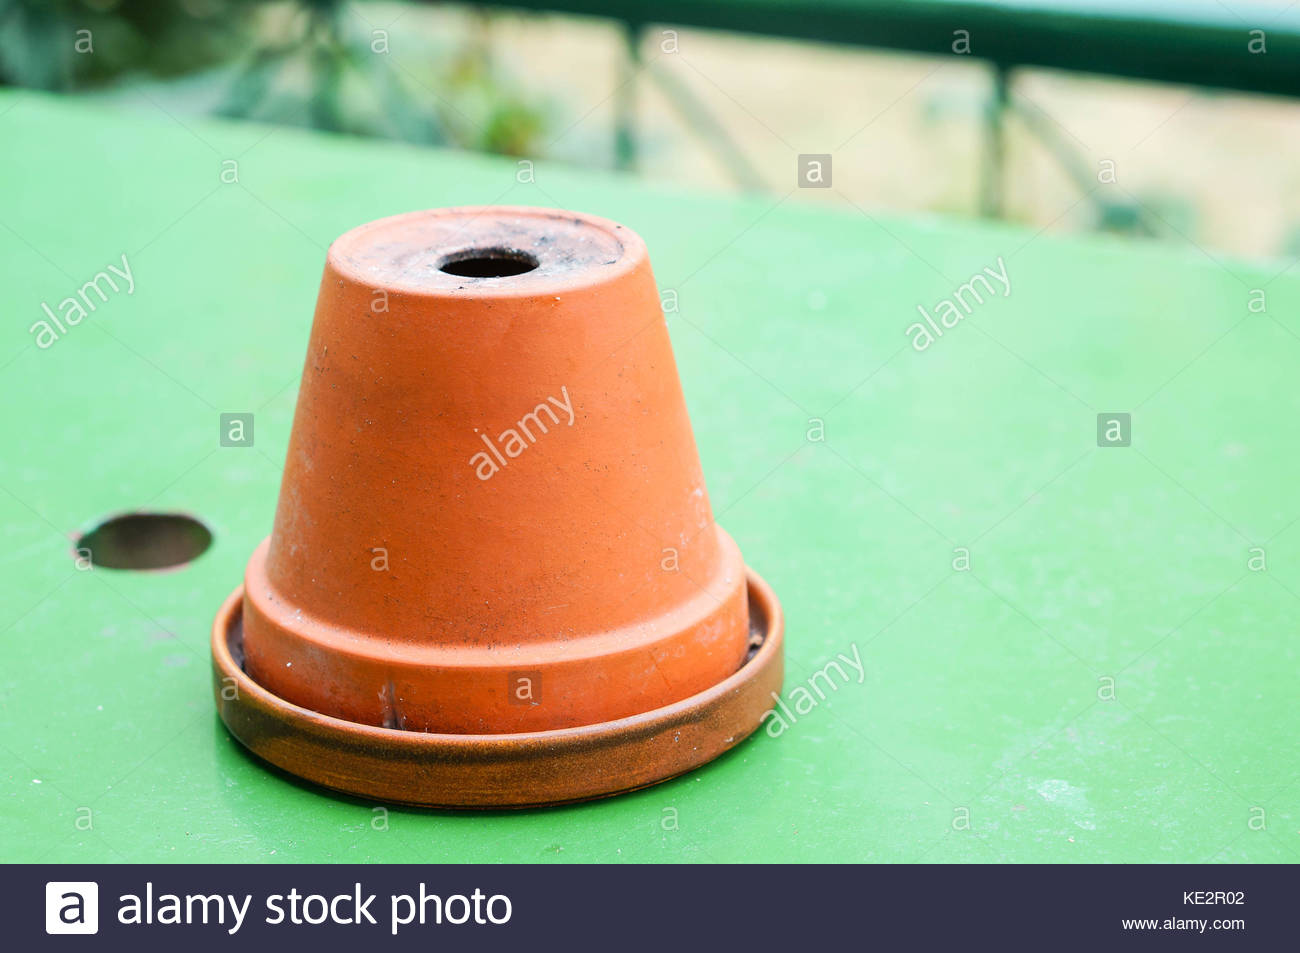 Alamy & Upside down flower pot as a ash tray Stock Photo: 163560434 - Alamy